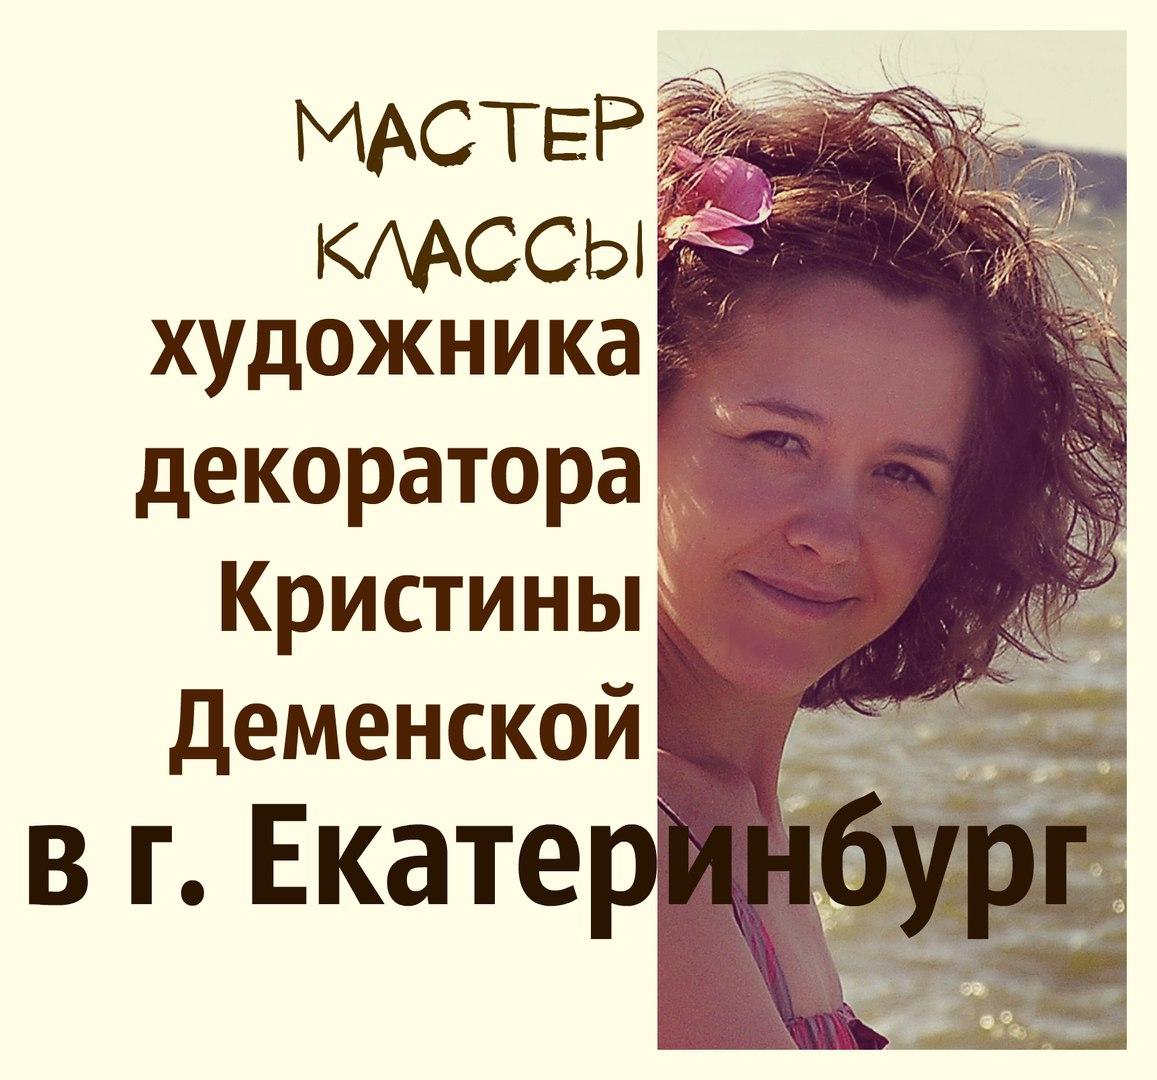 Афиша Екатеринбург Мастер классы Кристины Деменской в Екатеринбурге